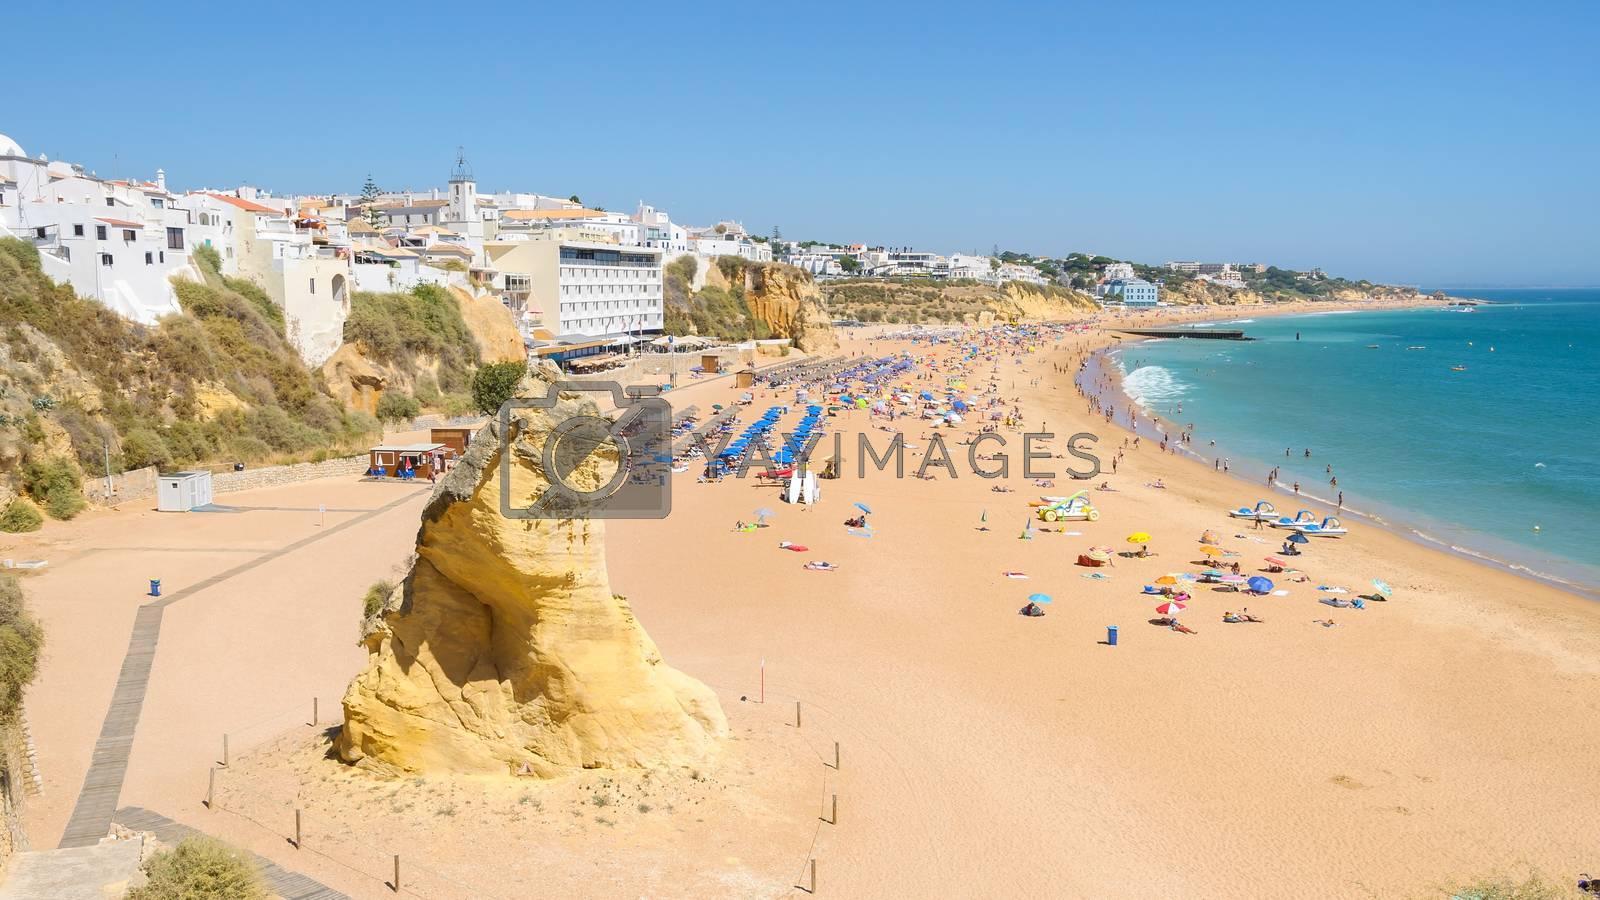 View of sunny public beach with sandstone rock in Albufeira, Algarve, Portugal